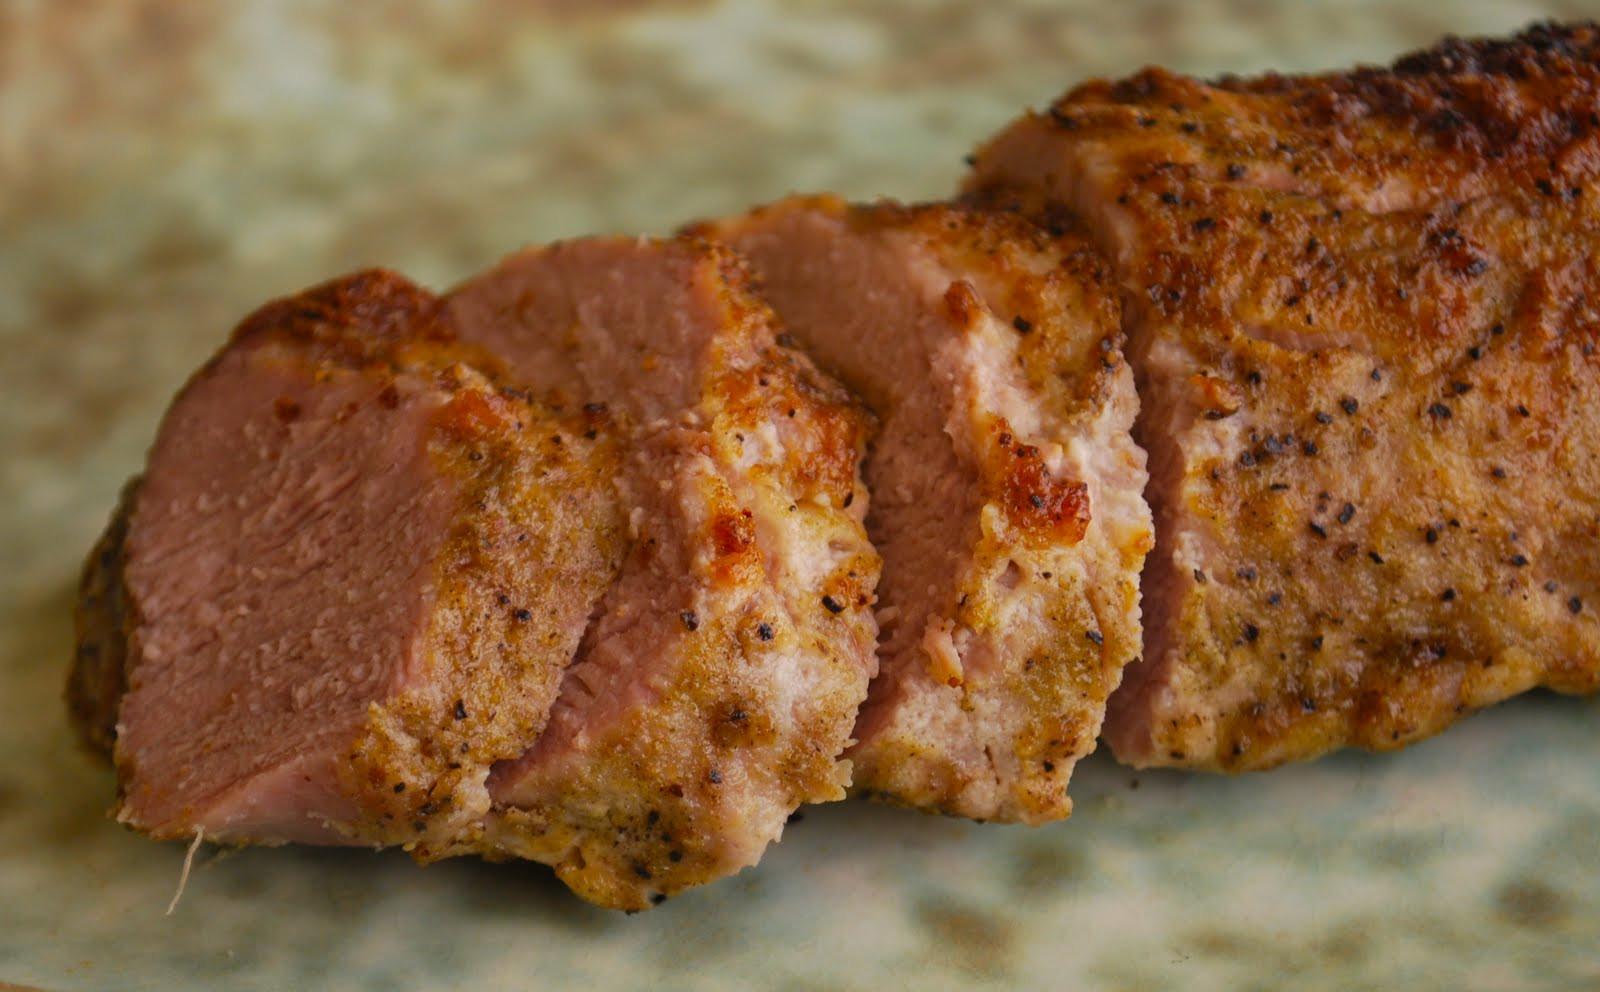 Easy Pork Tenderloin Recipes  Easy Pork Tenderloin with Cavender s Seasoning Amanda